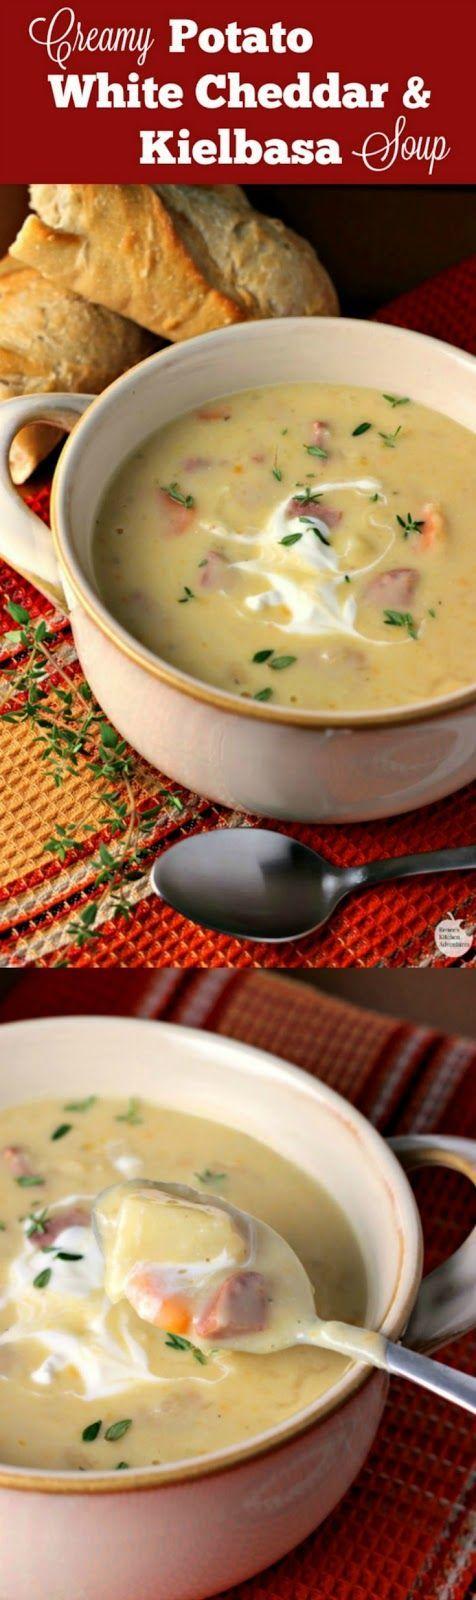 Creamy Potato White Cheddar and Kielbasa Soup